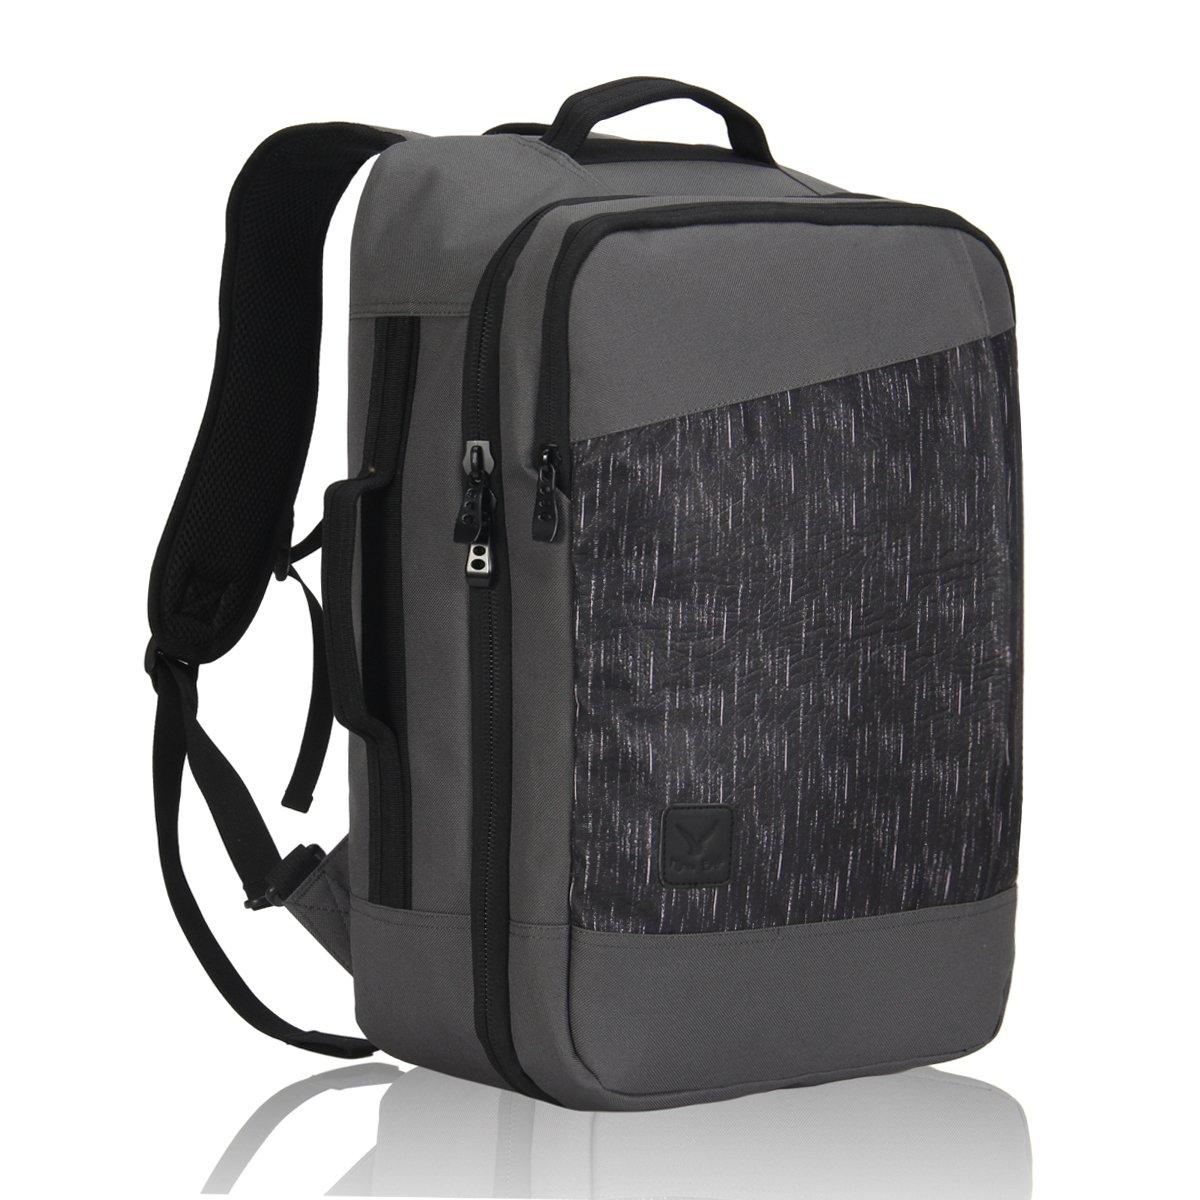 Veevan Flight Approved Carry on Backpack Business Weekend Bags Travel Rucksack 28 Liter Drak Blue VN217235